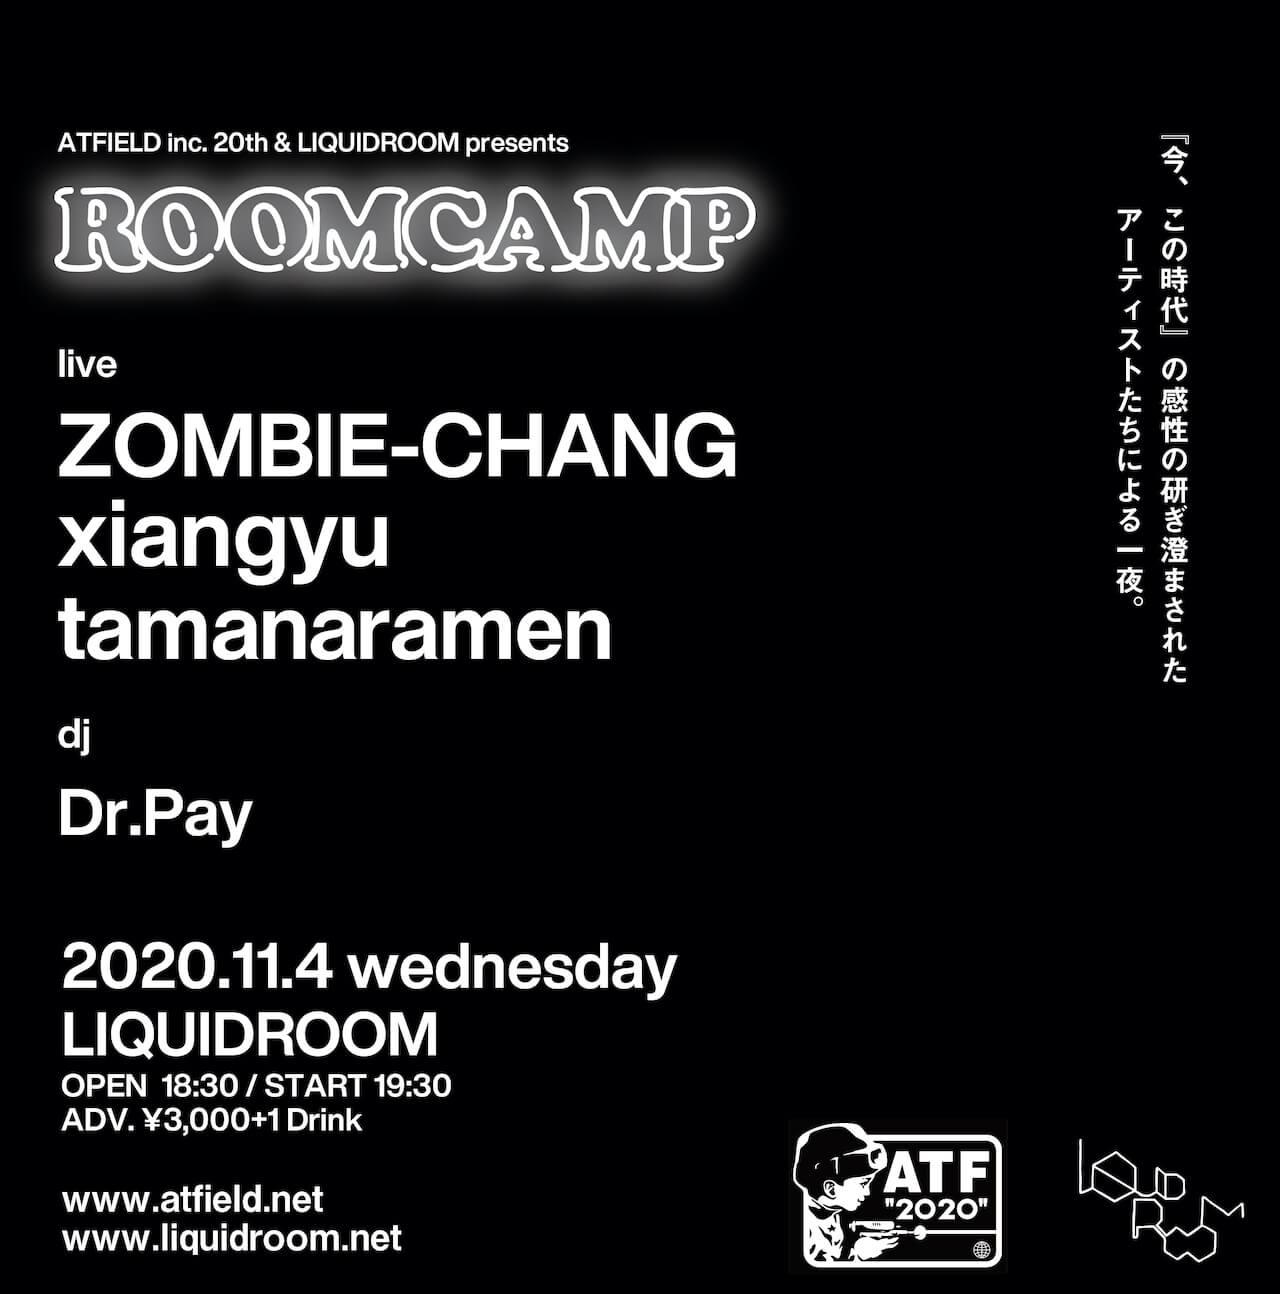 ATFIELDとLIQUIDROOMがタッグで初開催「ROOMCAMP」にZOMBIE-CHANG、xiangyu、玉名ラーメン、Dr.Payが出演 music201012-roomcamp-2